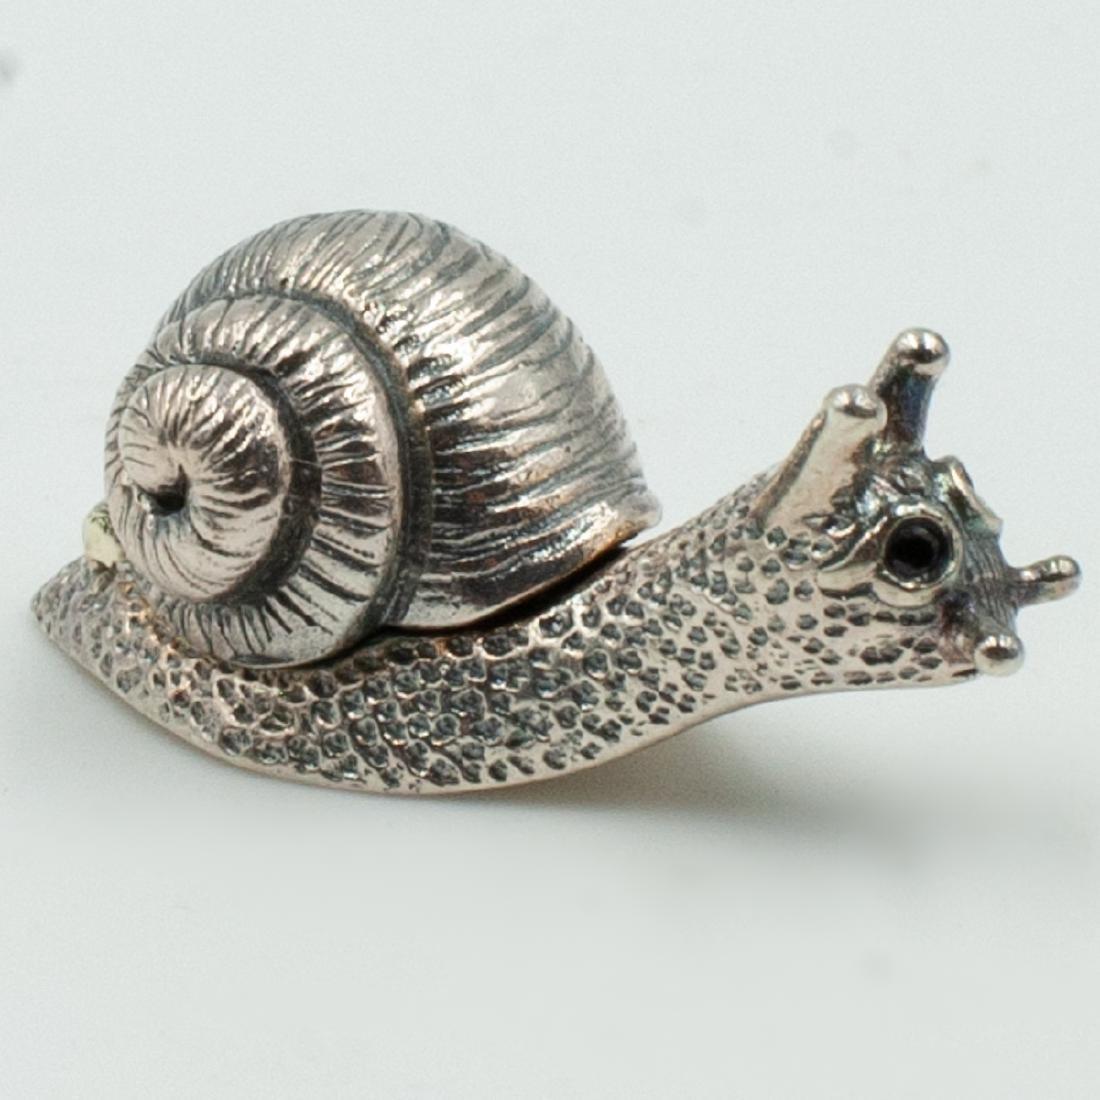 Miniature Sterling Snail Box